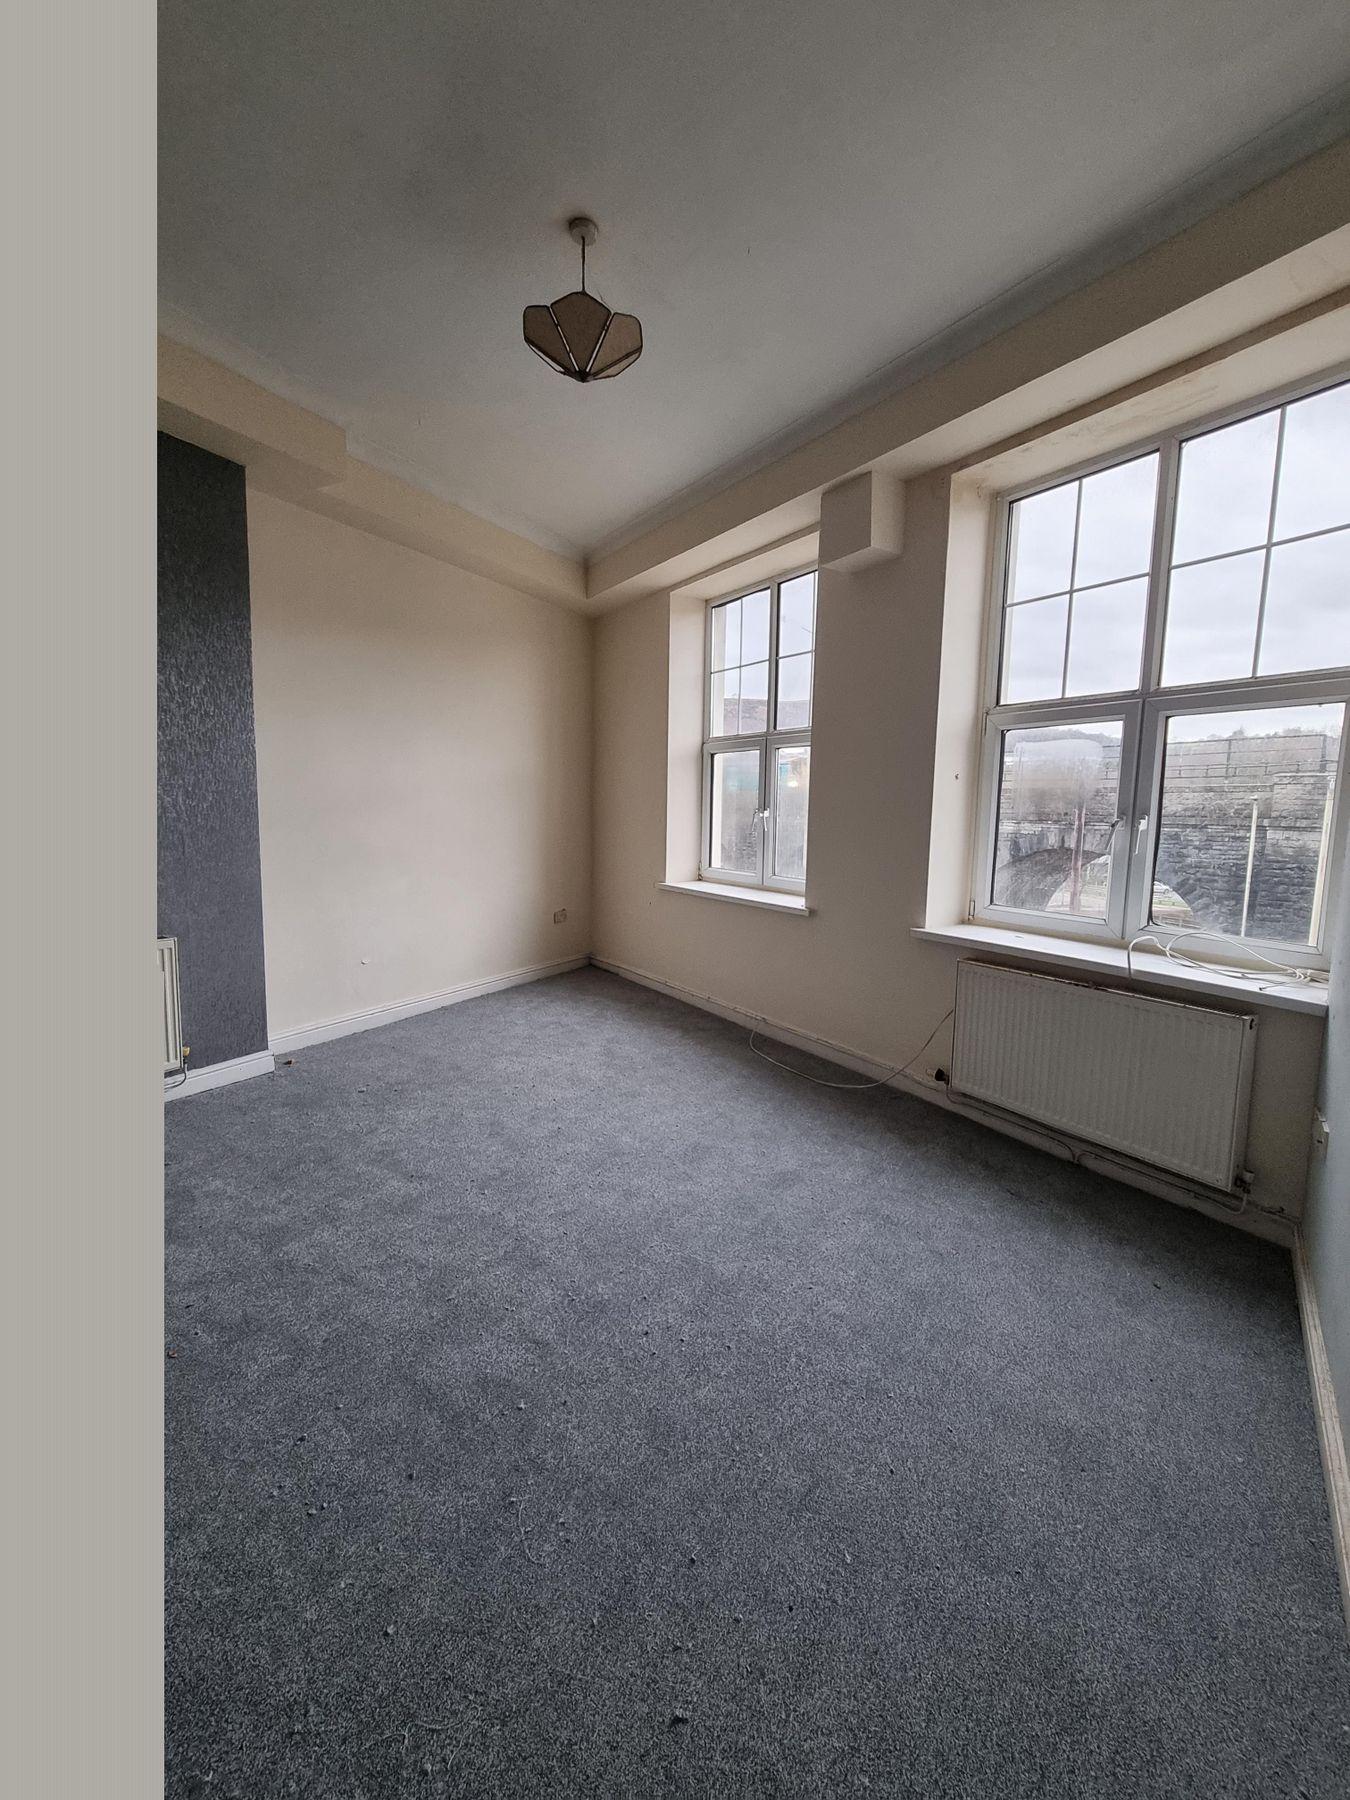 Property photo 1 of 3. 20210224_144742 (1)